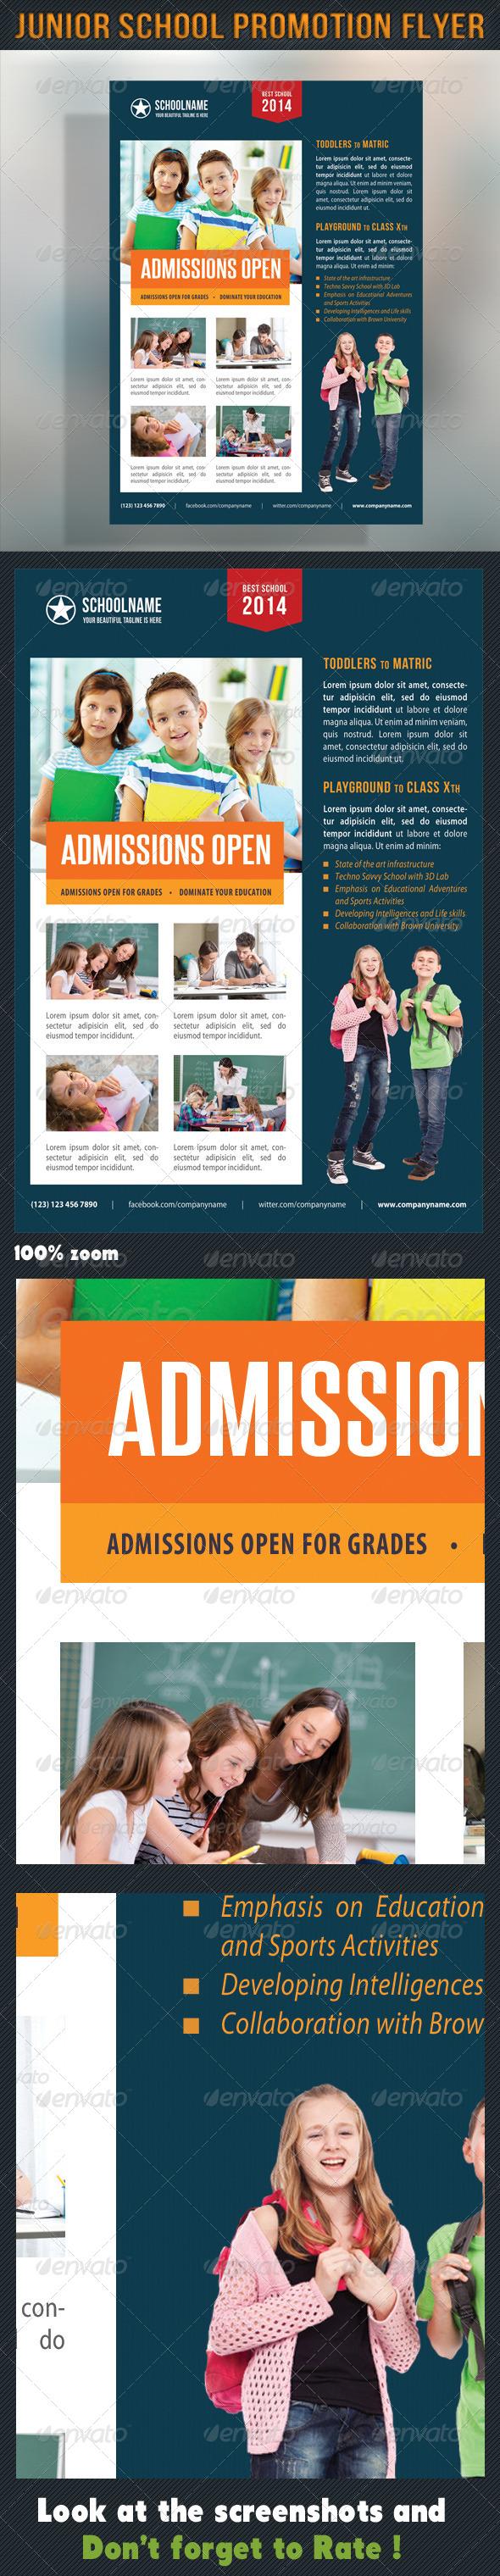 Junior School Promotion Flyer 09 - Events Flyers